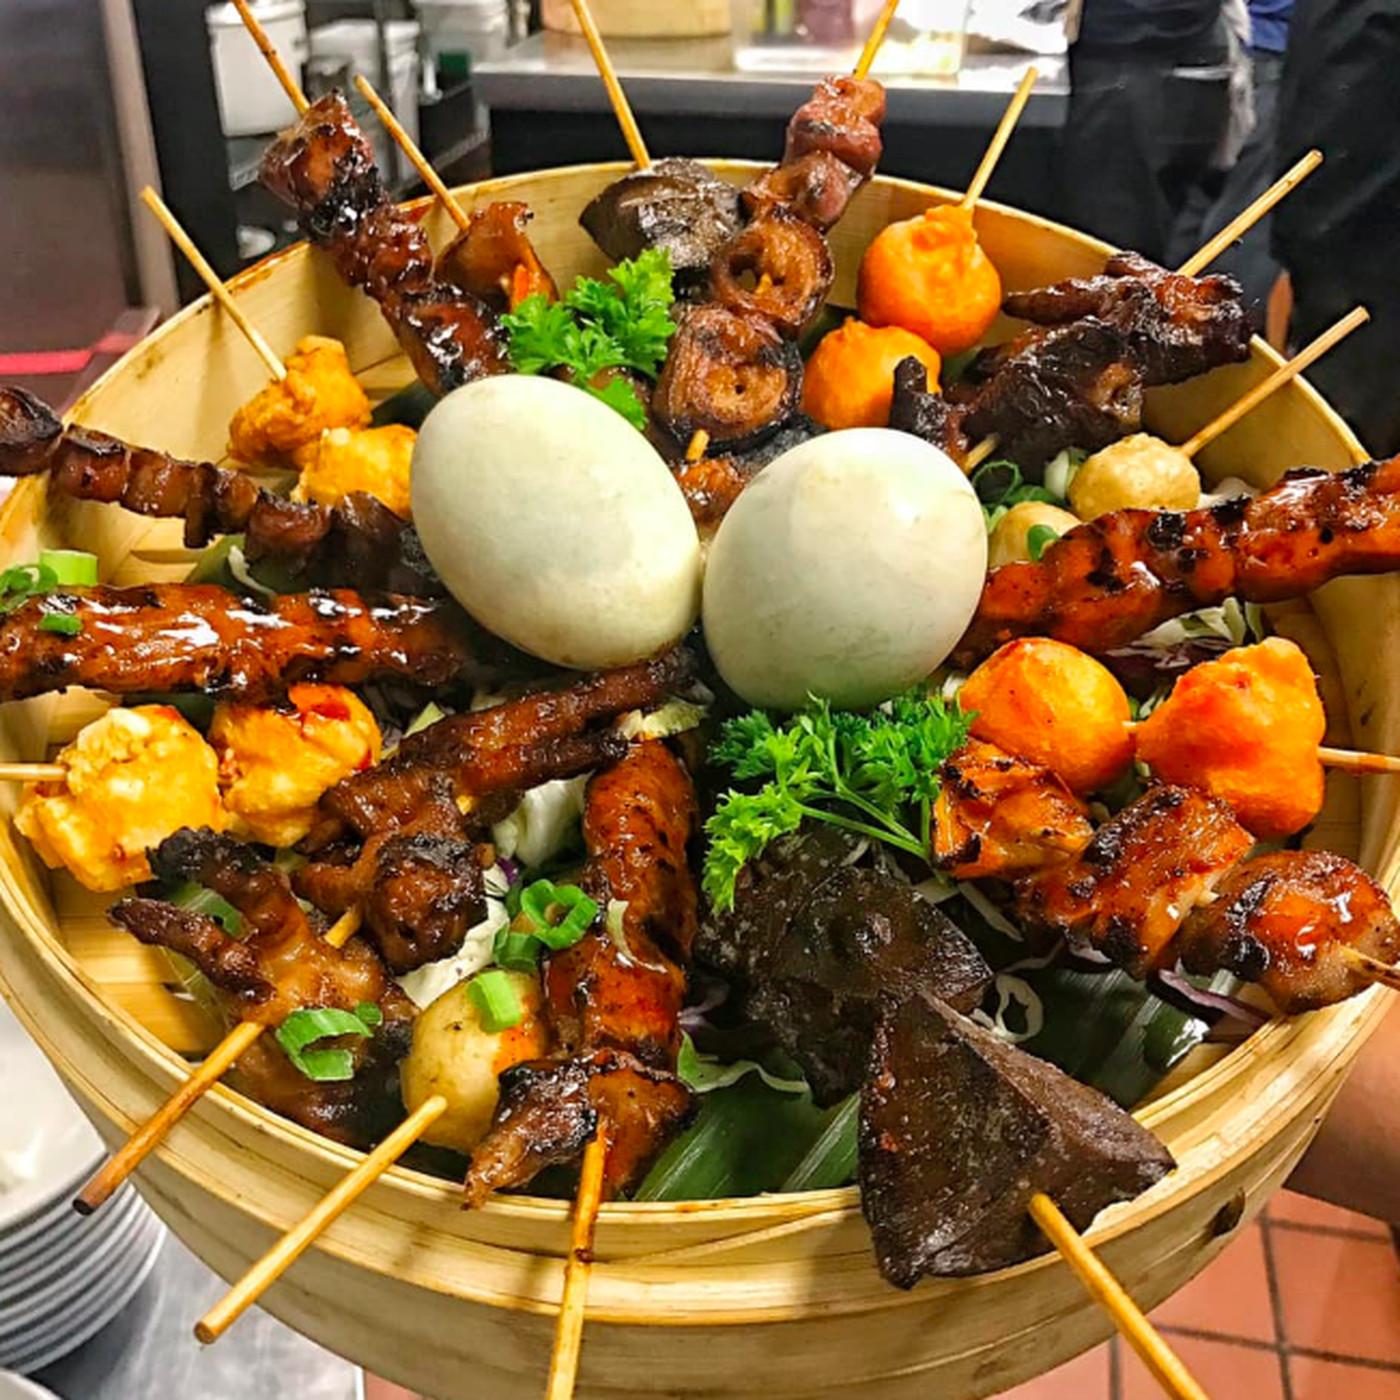 la filipino restaurant noypitz opened a third location in little tokyo eater la la filipino restaurant noypitz opened a